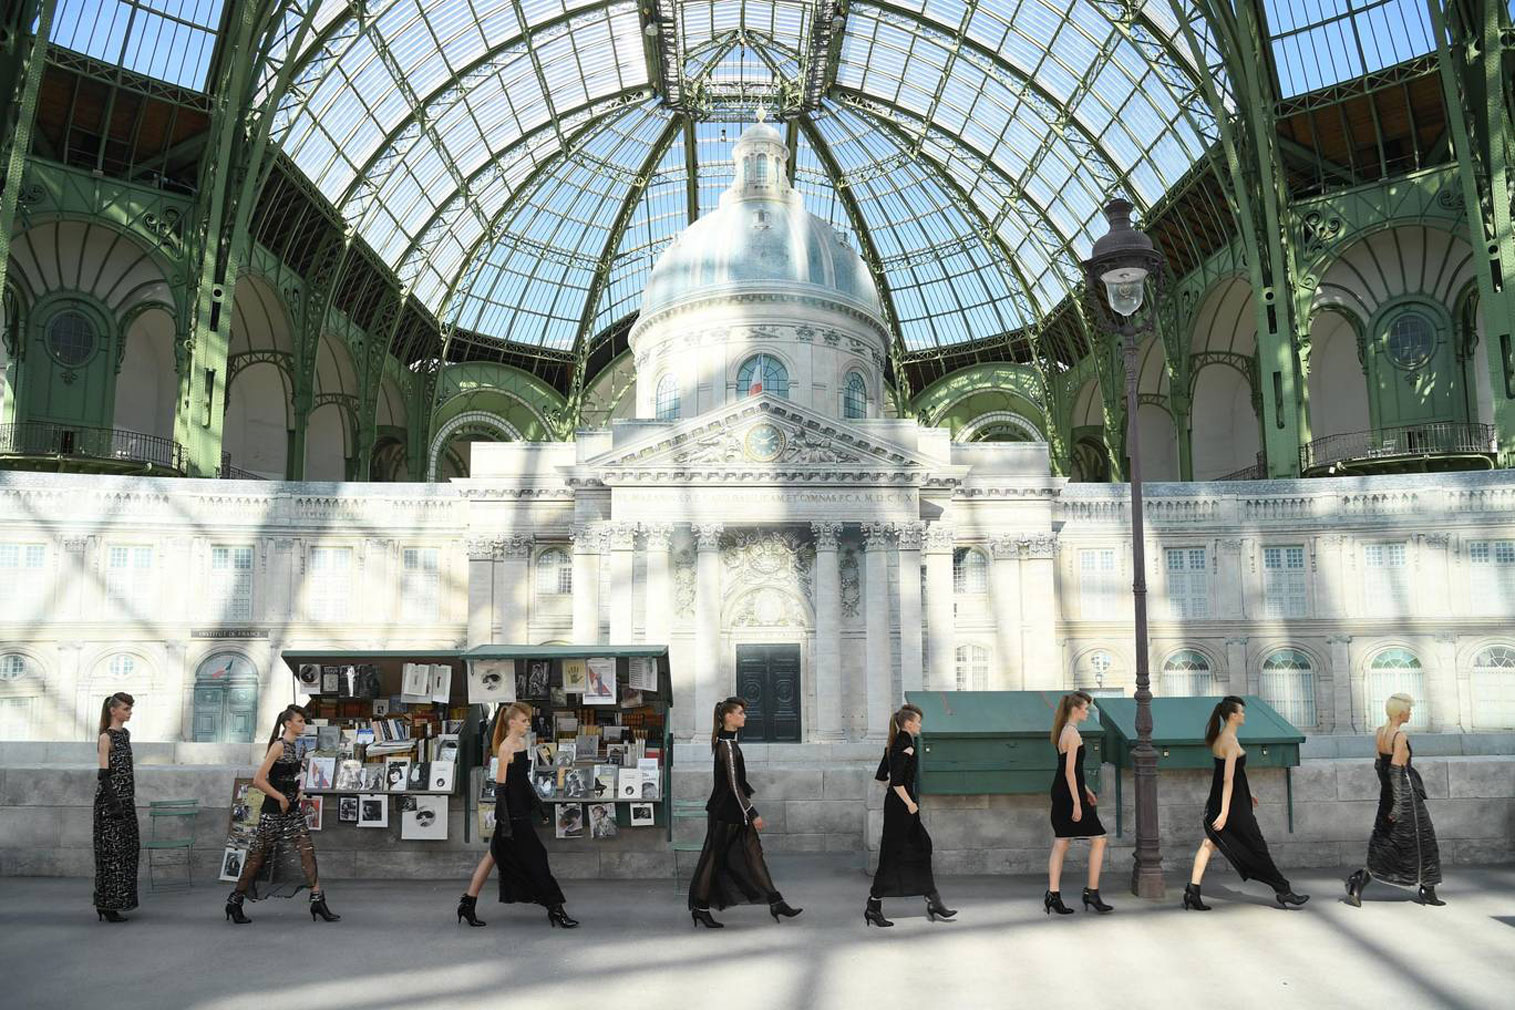 Rue de Chanel, Parisian street - AW18 Couture fashion show set